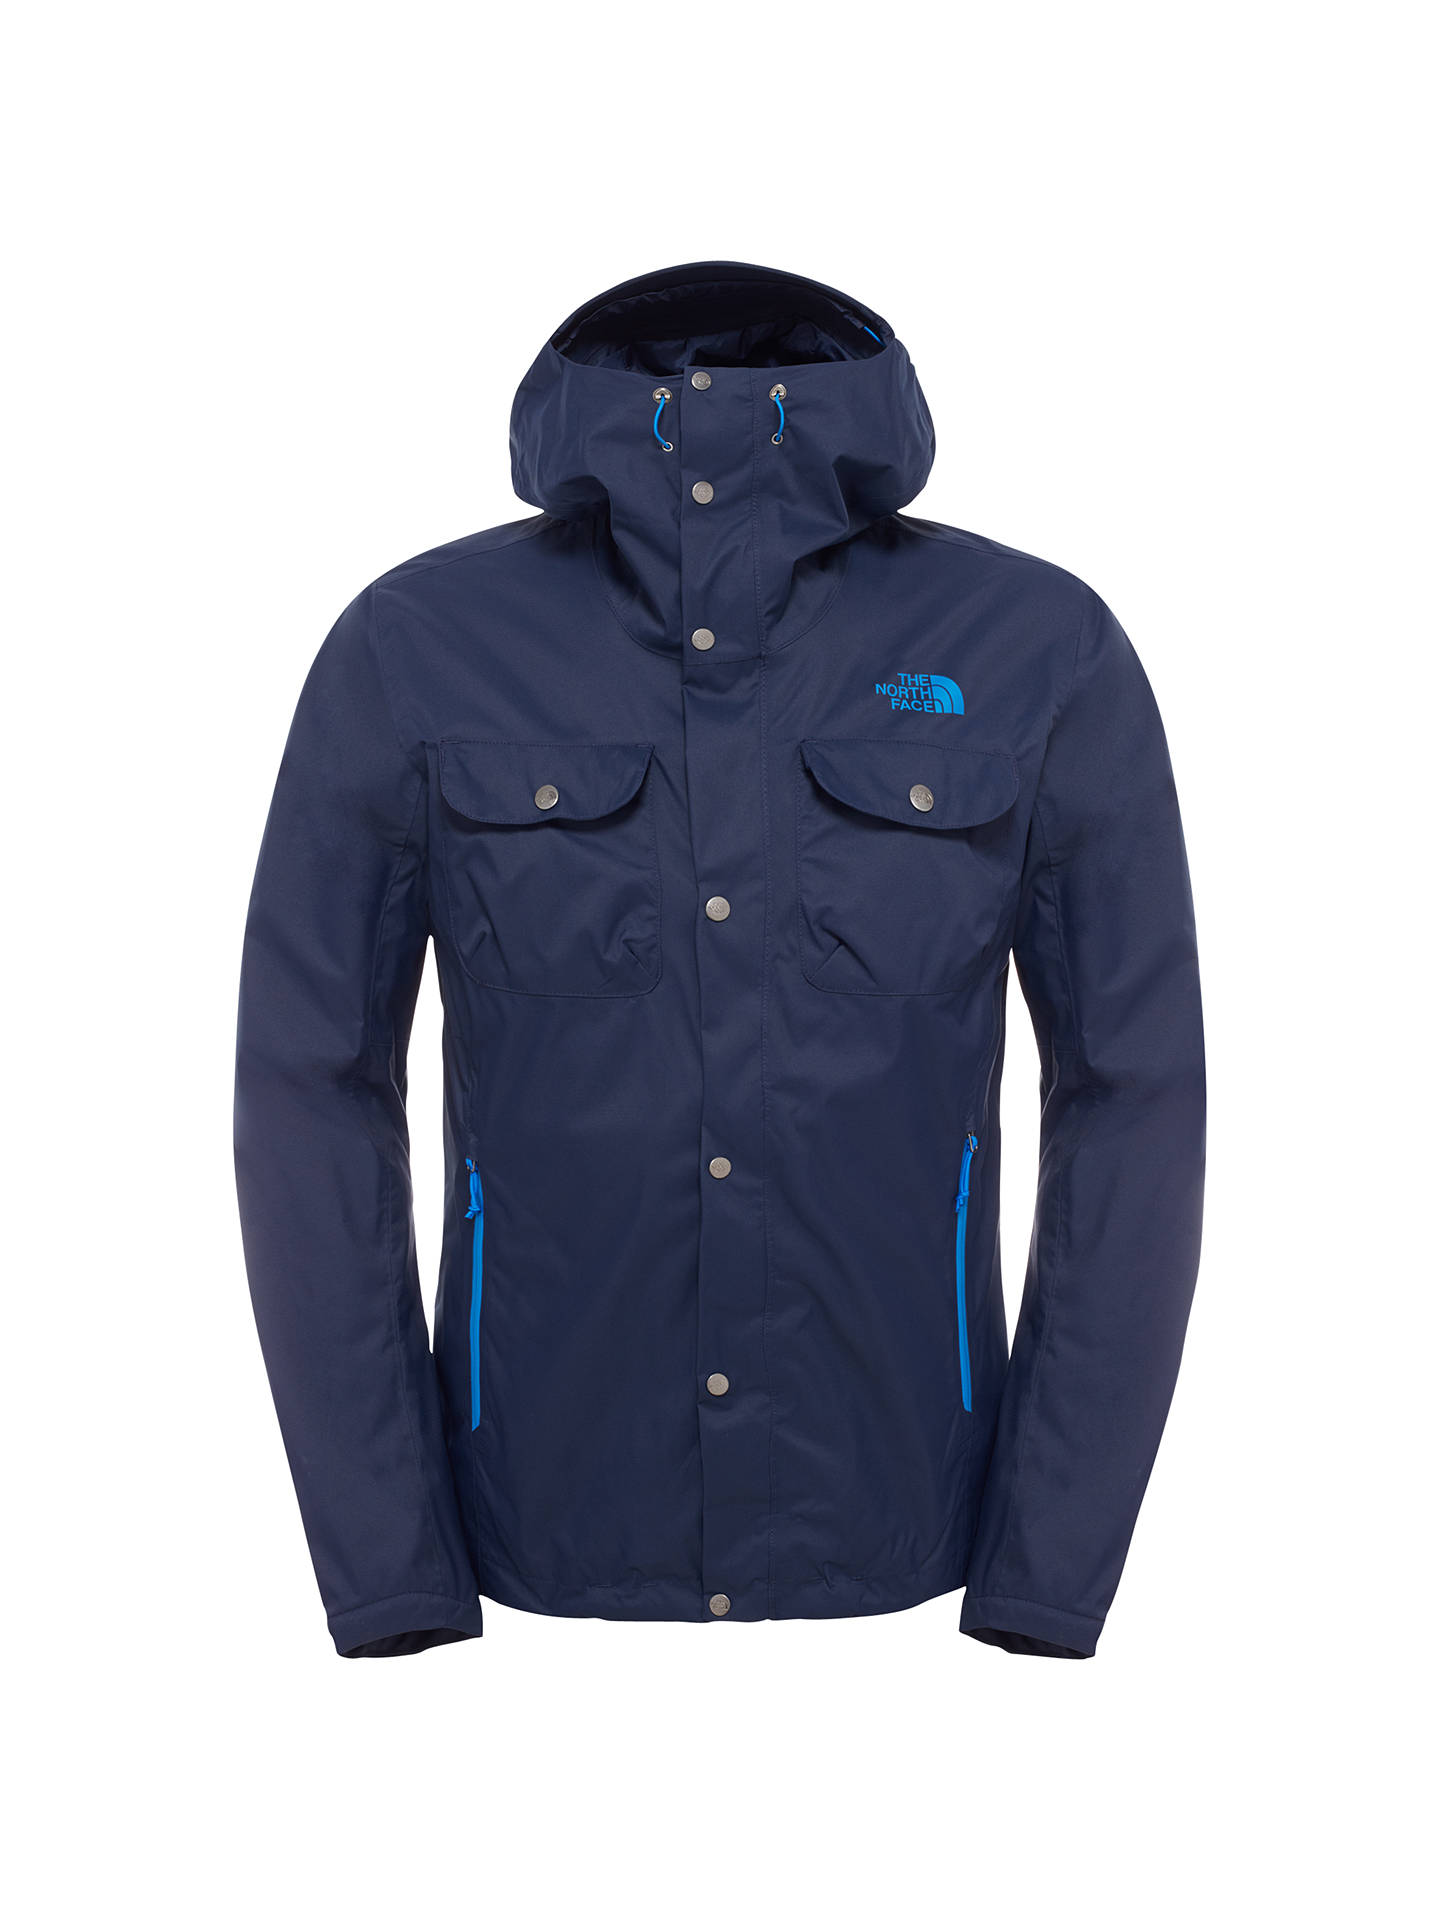 fbfe99af74da Buy The North Face Arrano Waterproof Men s Jacket